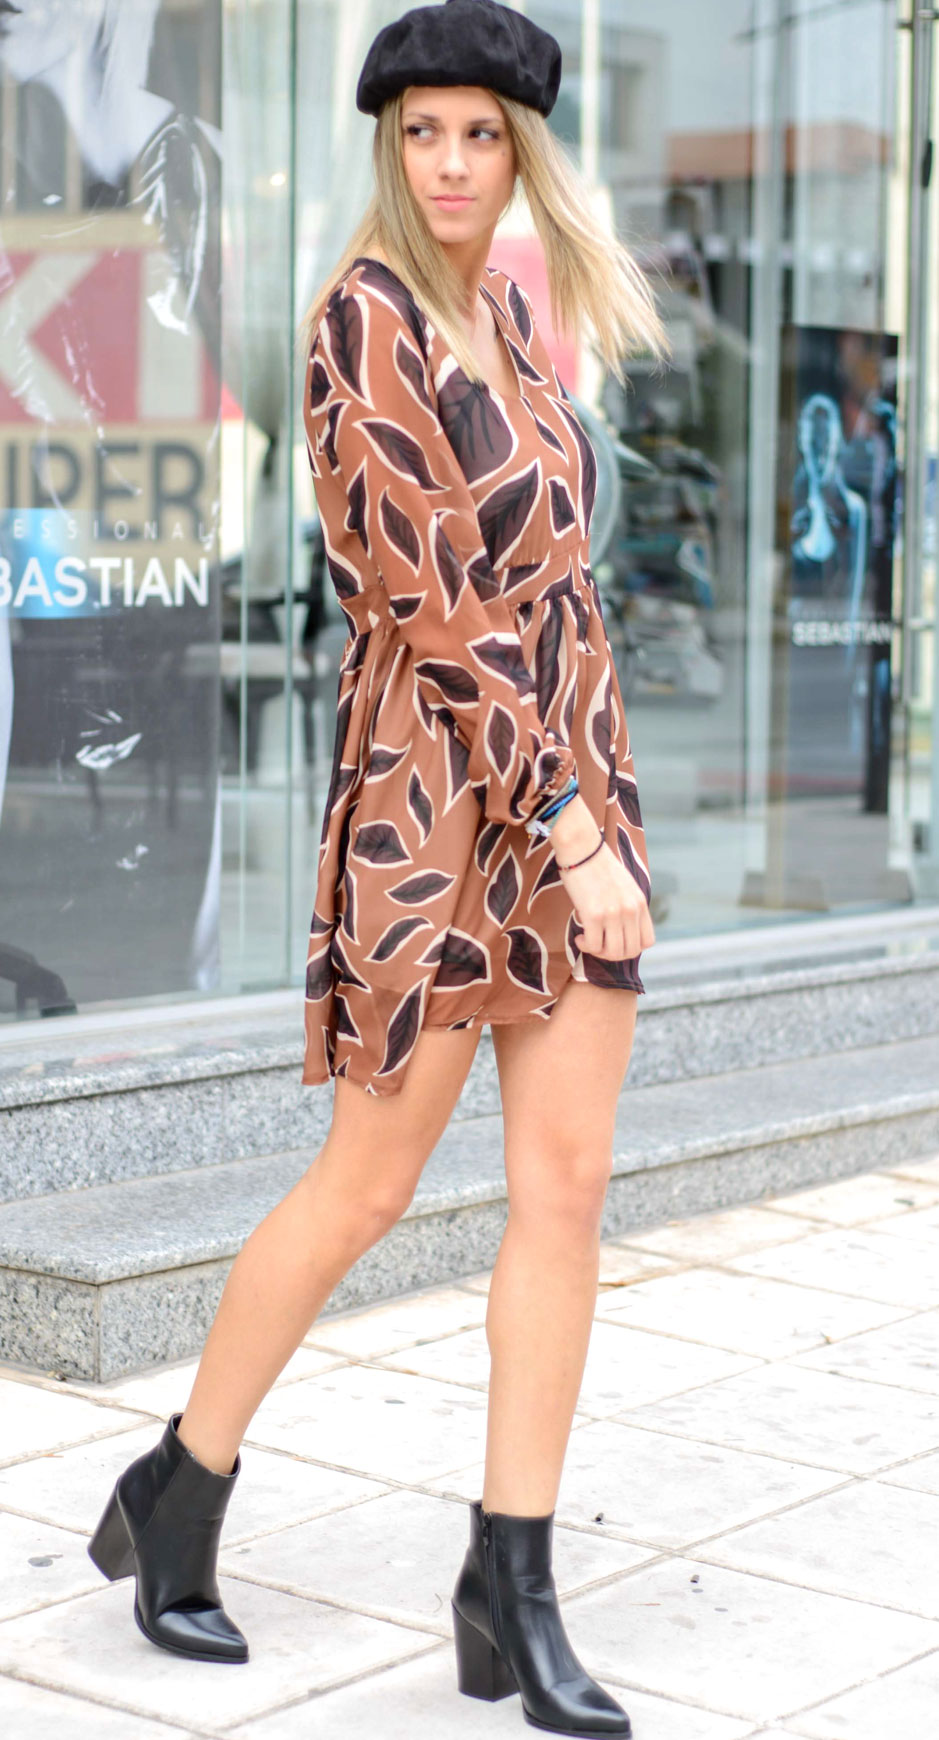 1c7354f47236 Φόρεμα εμπριμέ σε αποχρώσεις ταμπα-καφέ με μήκος στο γόνατο και ...